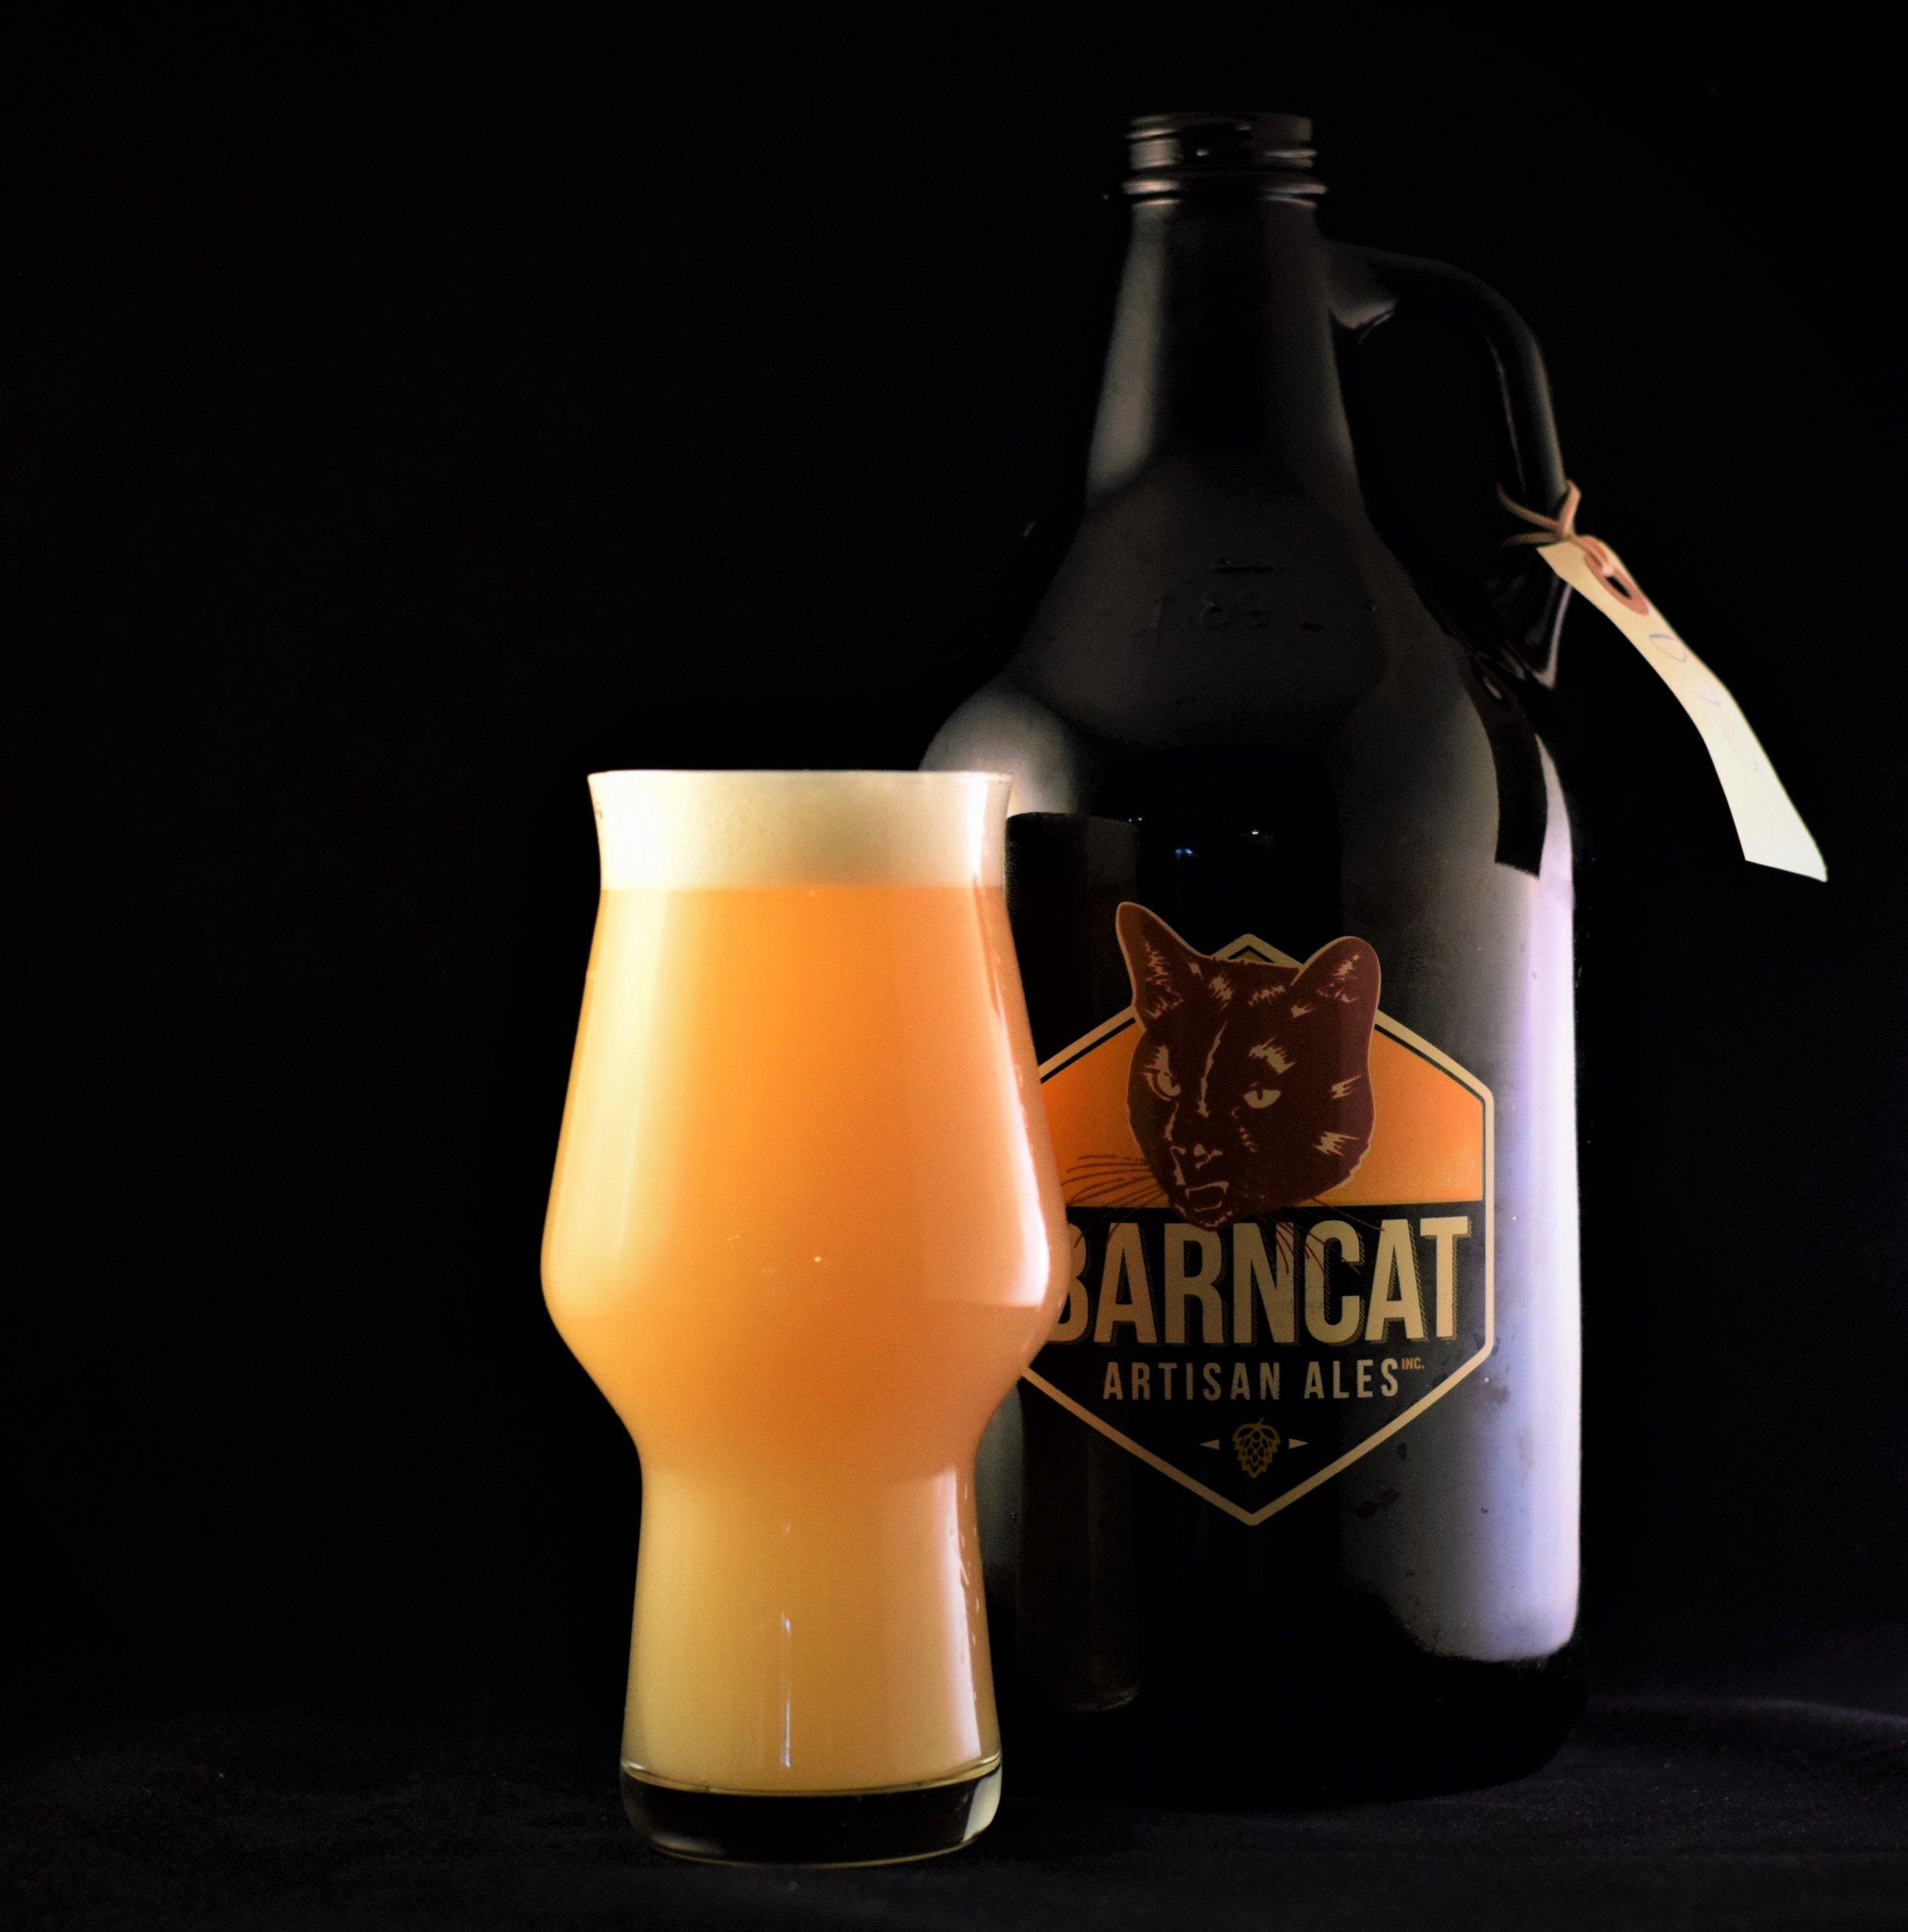 Barncat's, Double The Juice DIPA